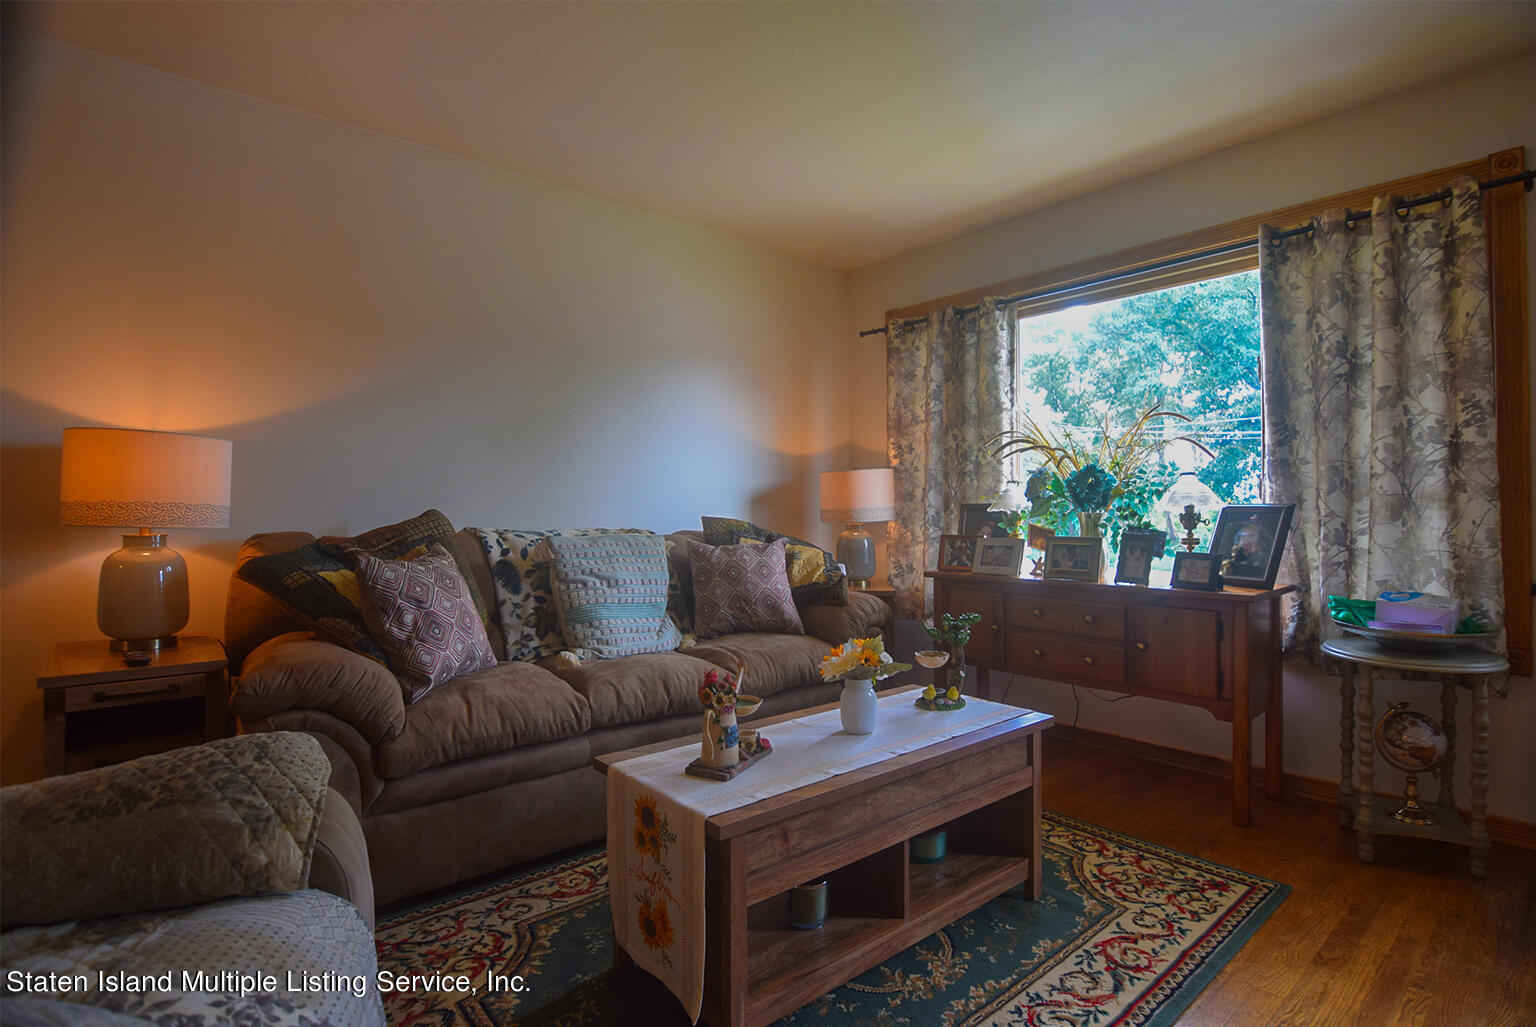 Single Family - Semi-Attached 524 Tennyson Drive  Staten Island, NY 10312, MLS-1149452-3